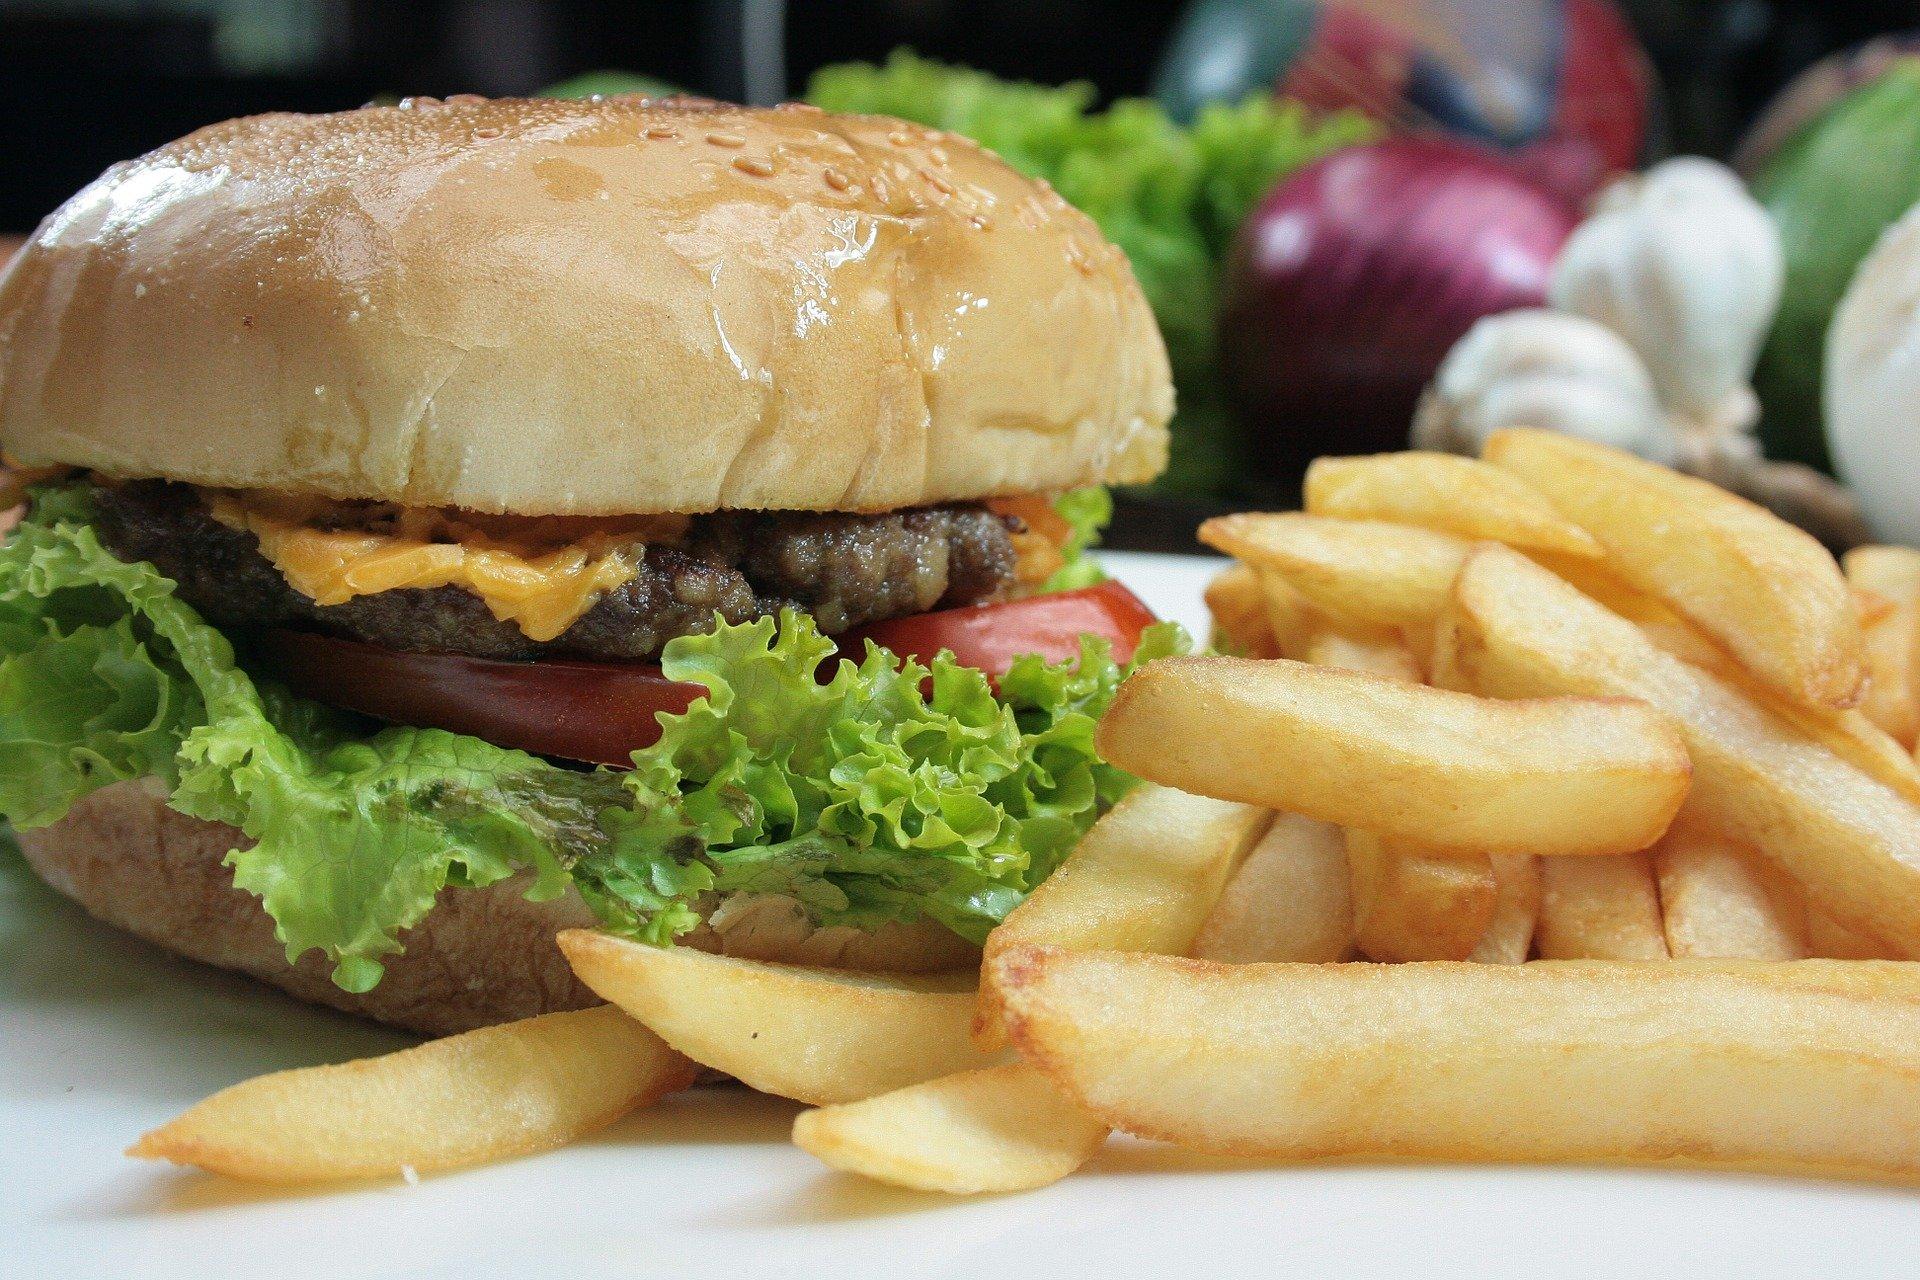 Duffy's Tavern Miami cheeseburger